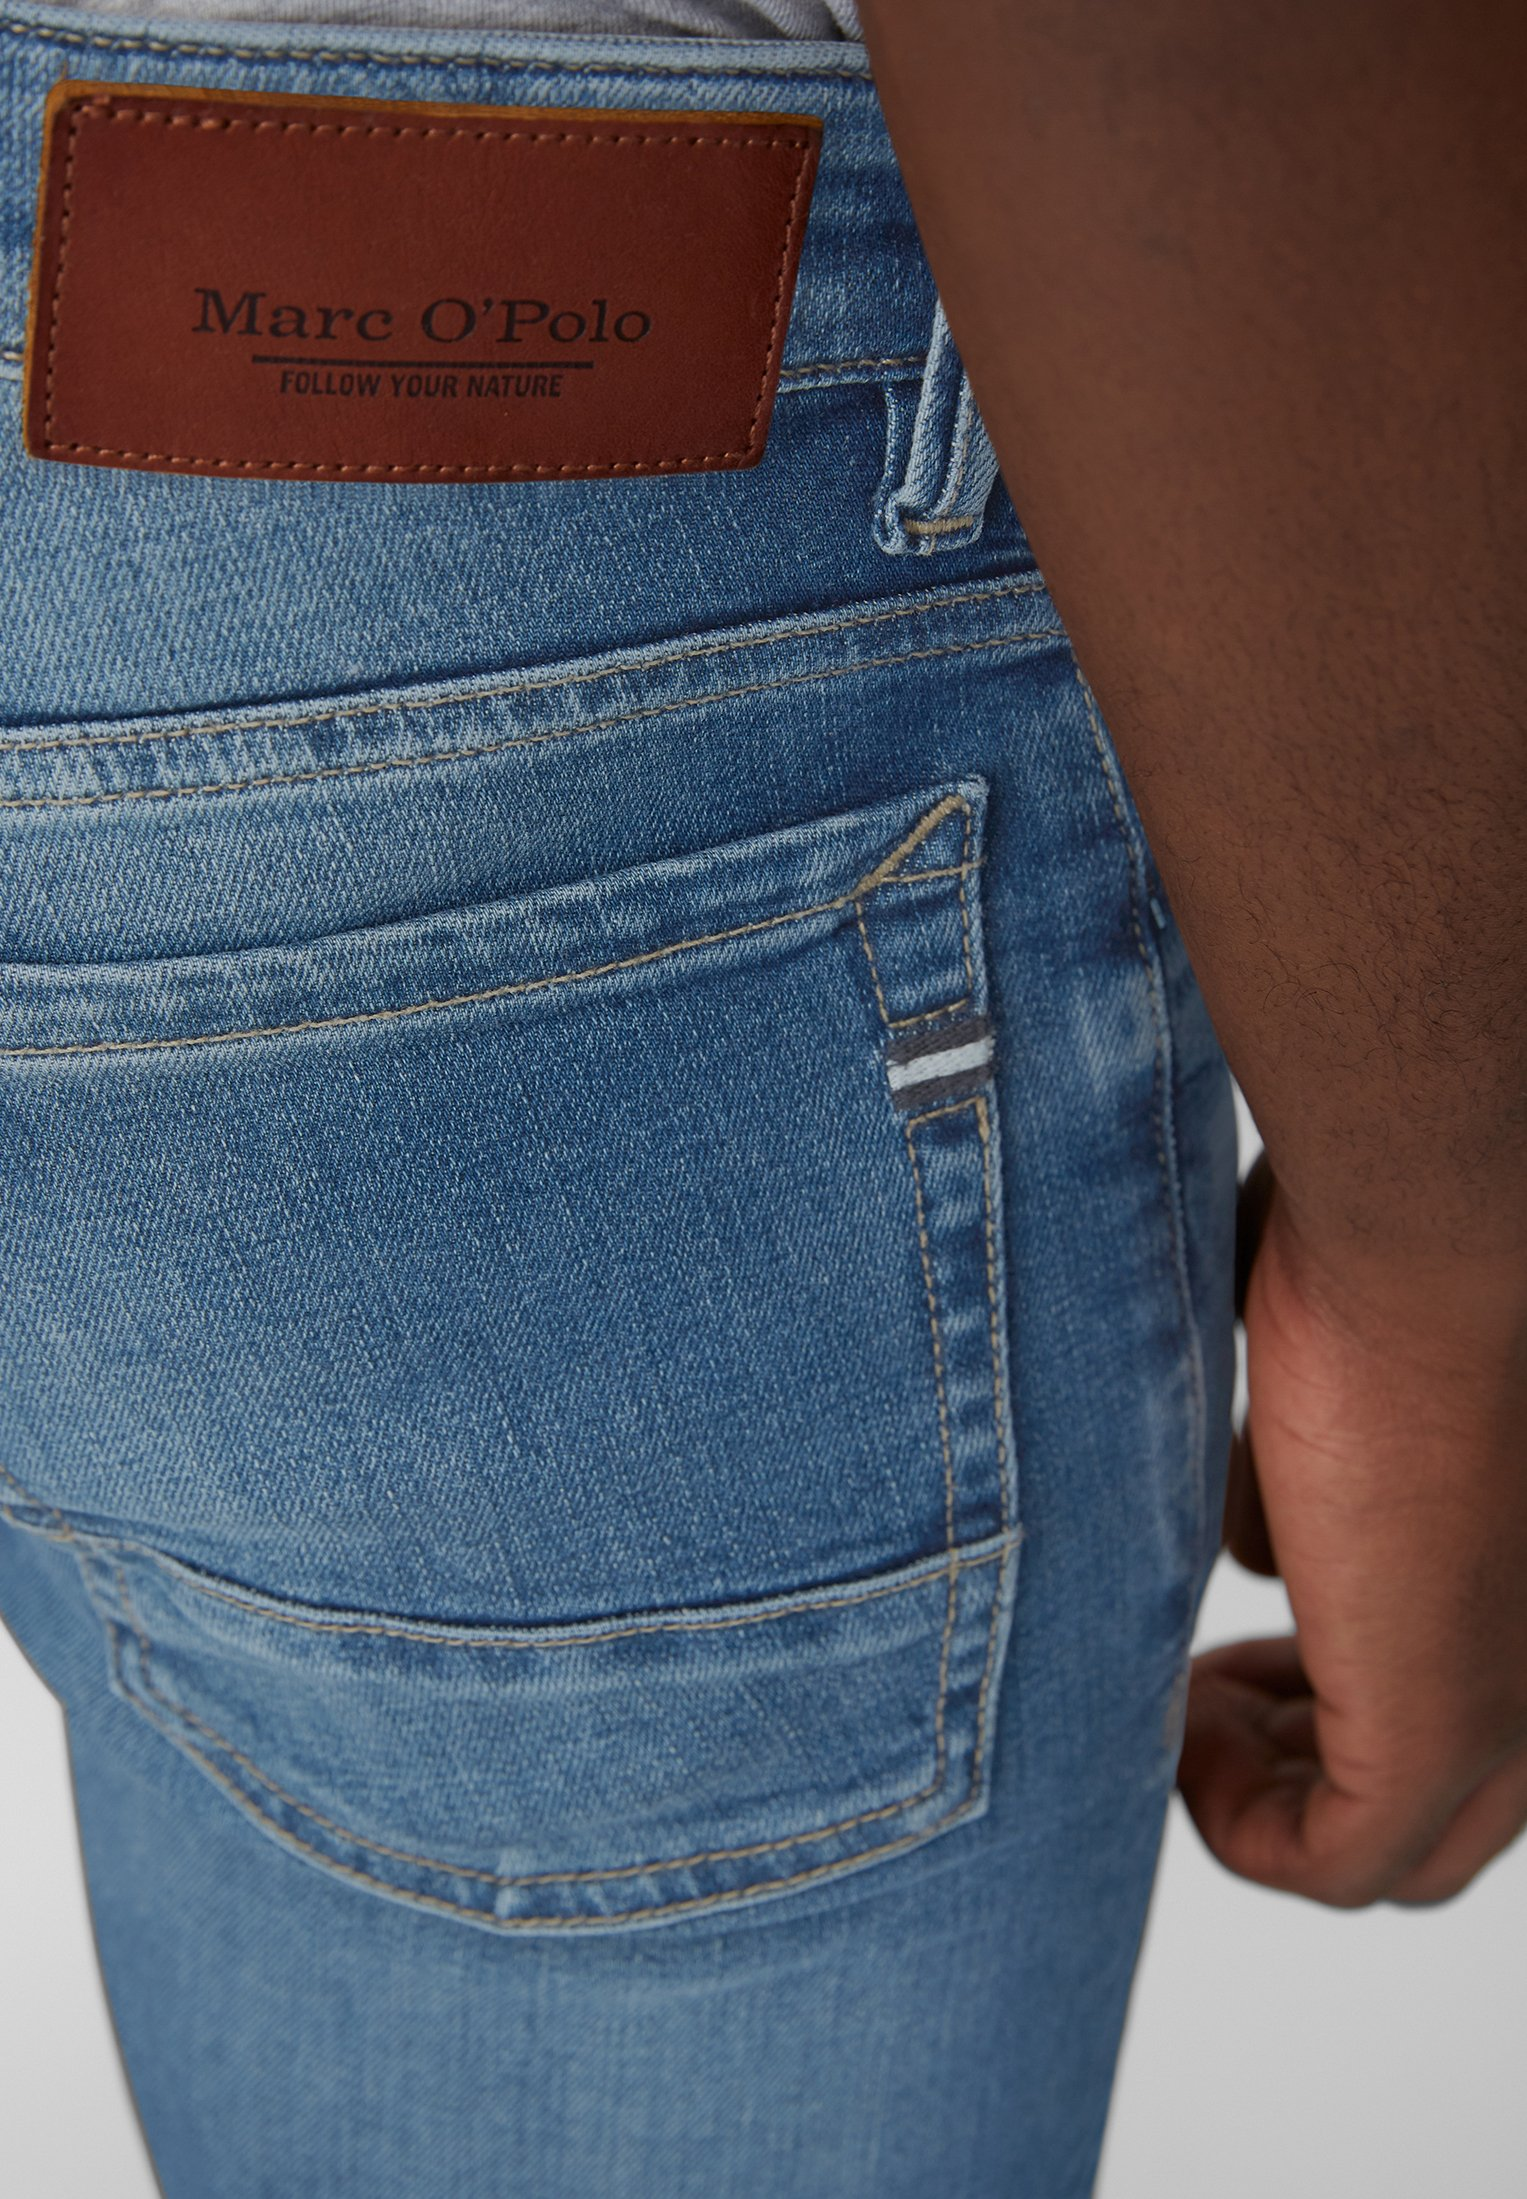 Marc O'polo Sjöbo - Slim Fit Jeans Blue I2AwRaV